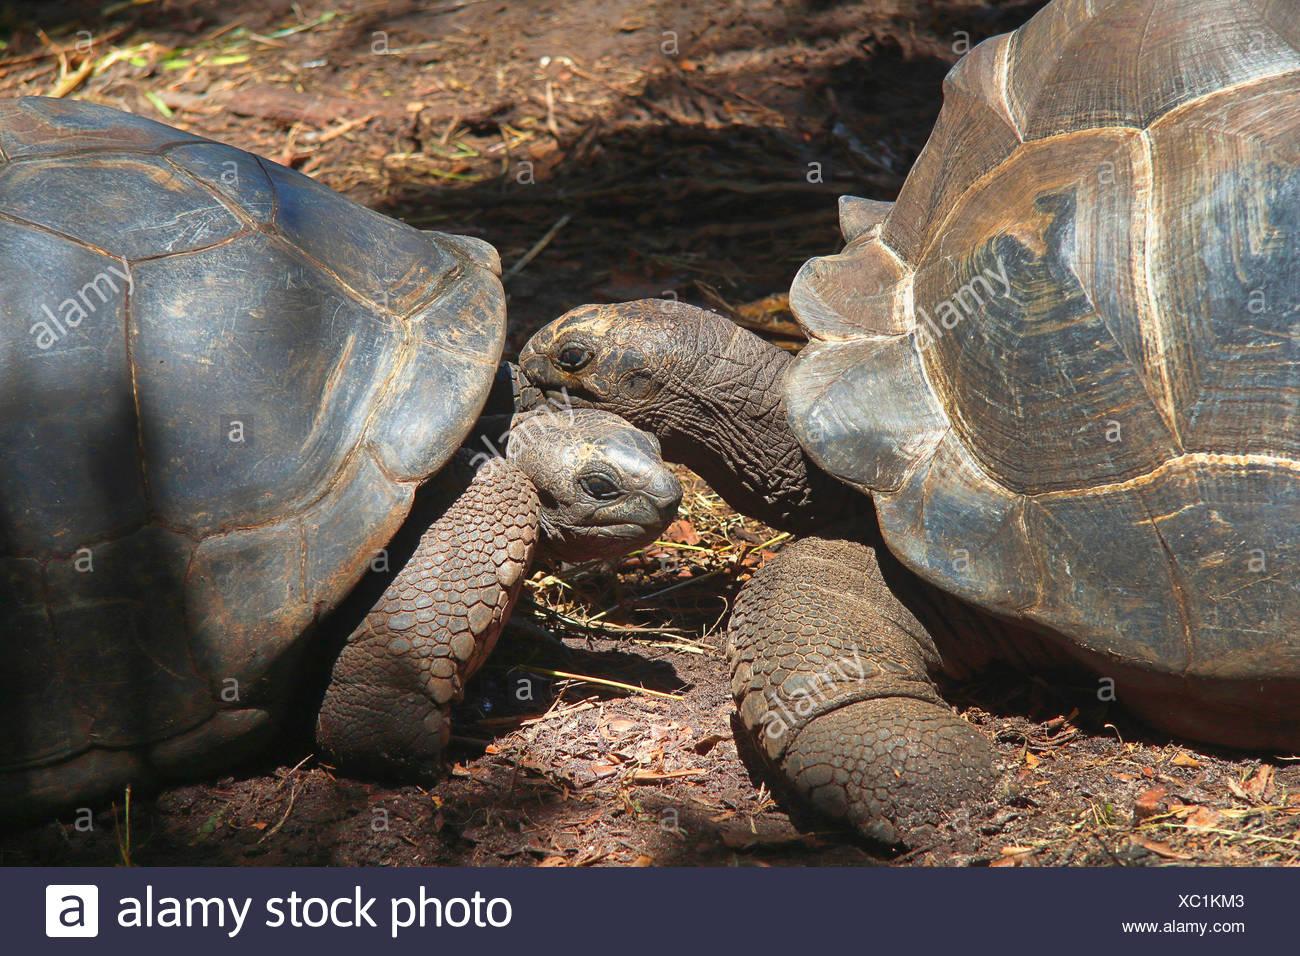 Seychelles giant tortoise, Aldabran giant tortoise, Aldabra giant tortoise (Aldabrachelys gigantea, Testudo gigantea, Geochelone gigantea, Megalochelys gigantea), portrait of two animals, Seychelles, La Digue - Stock Image